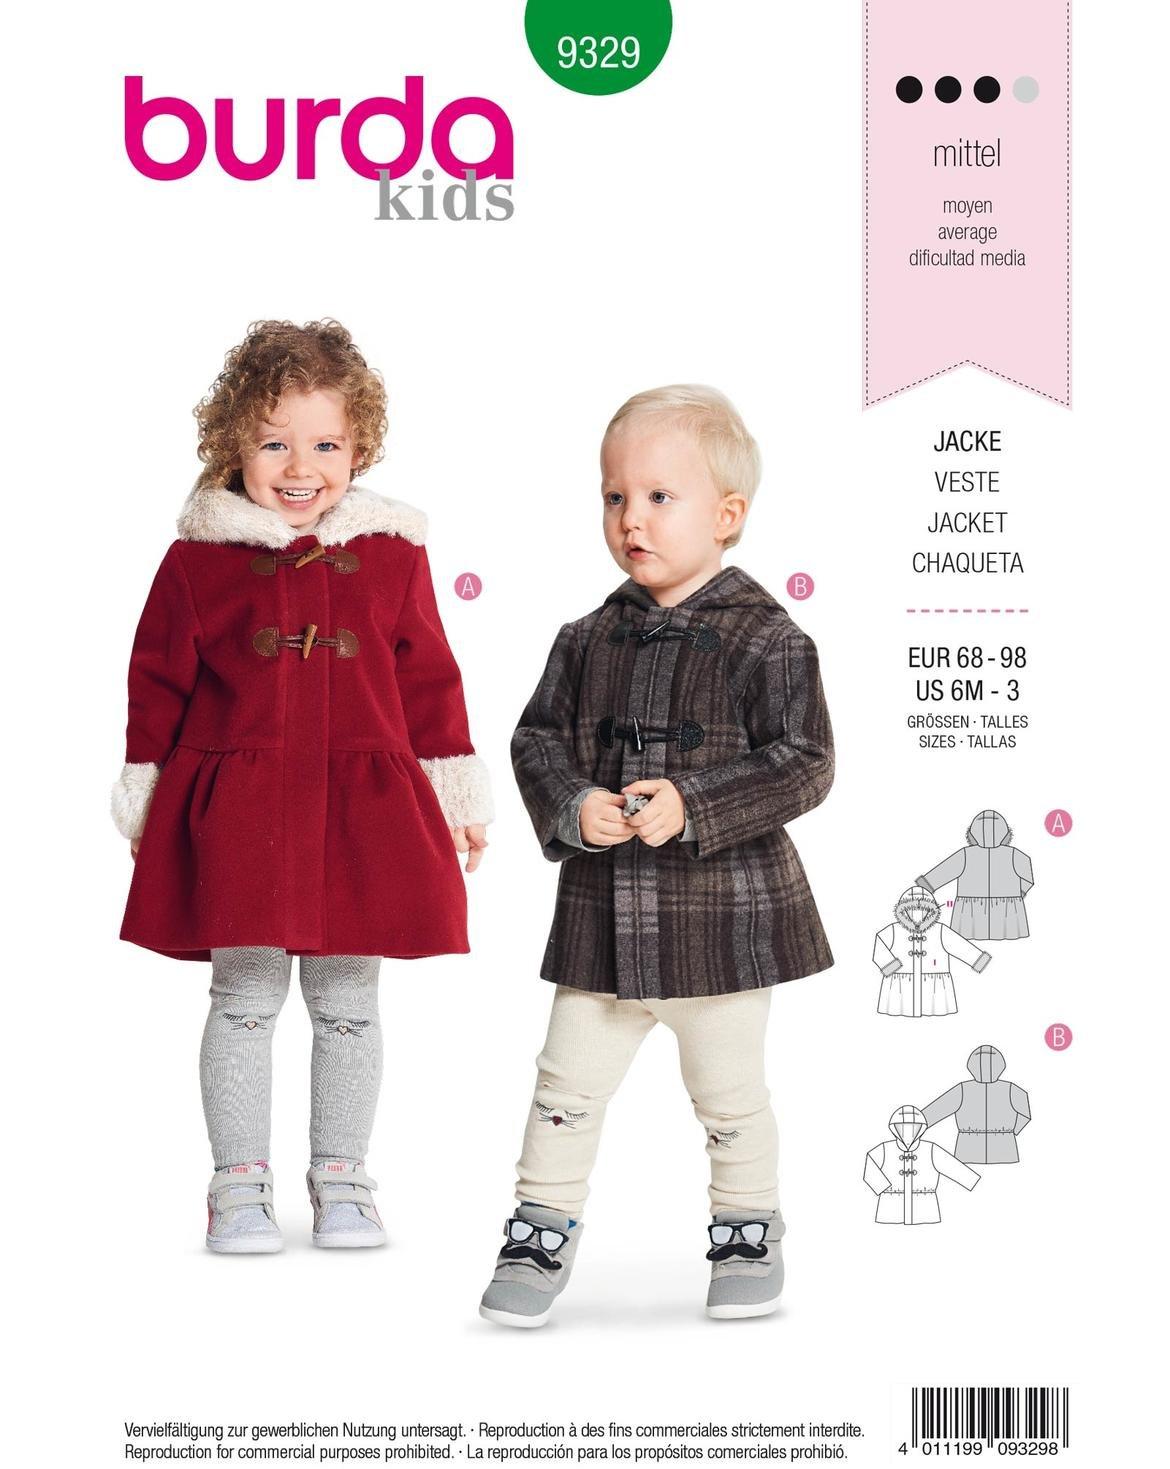 Burda Patron 9329 Childrens Jacket 68-98 cm